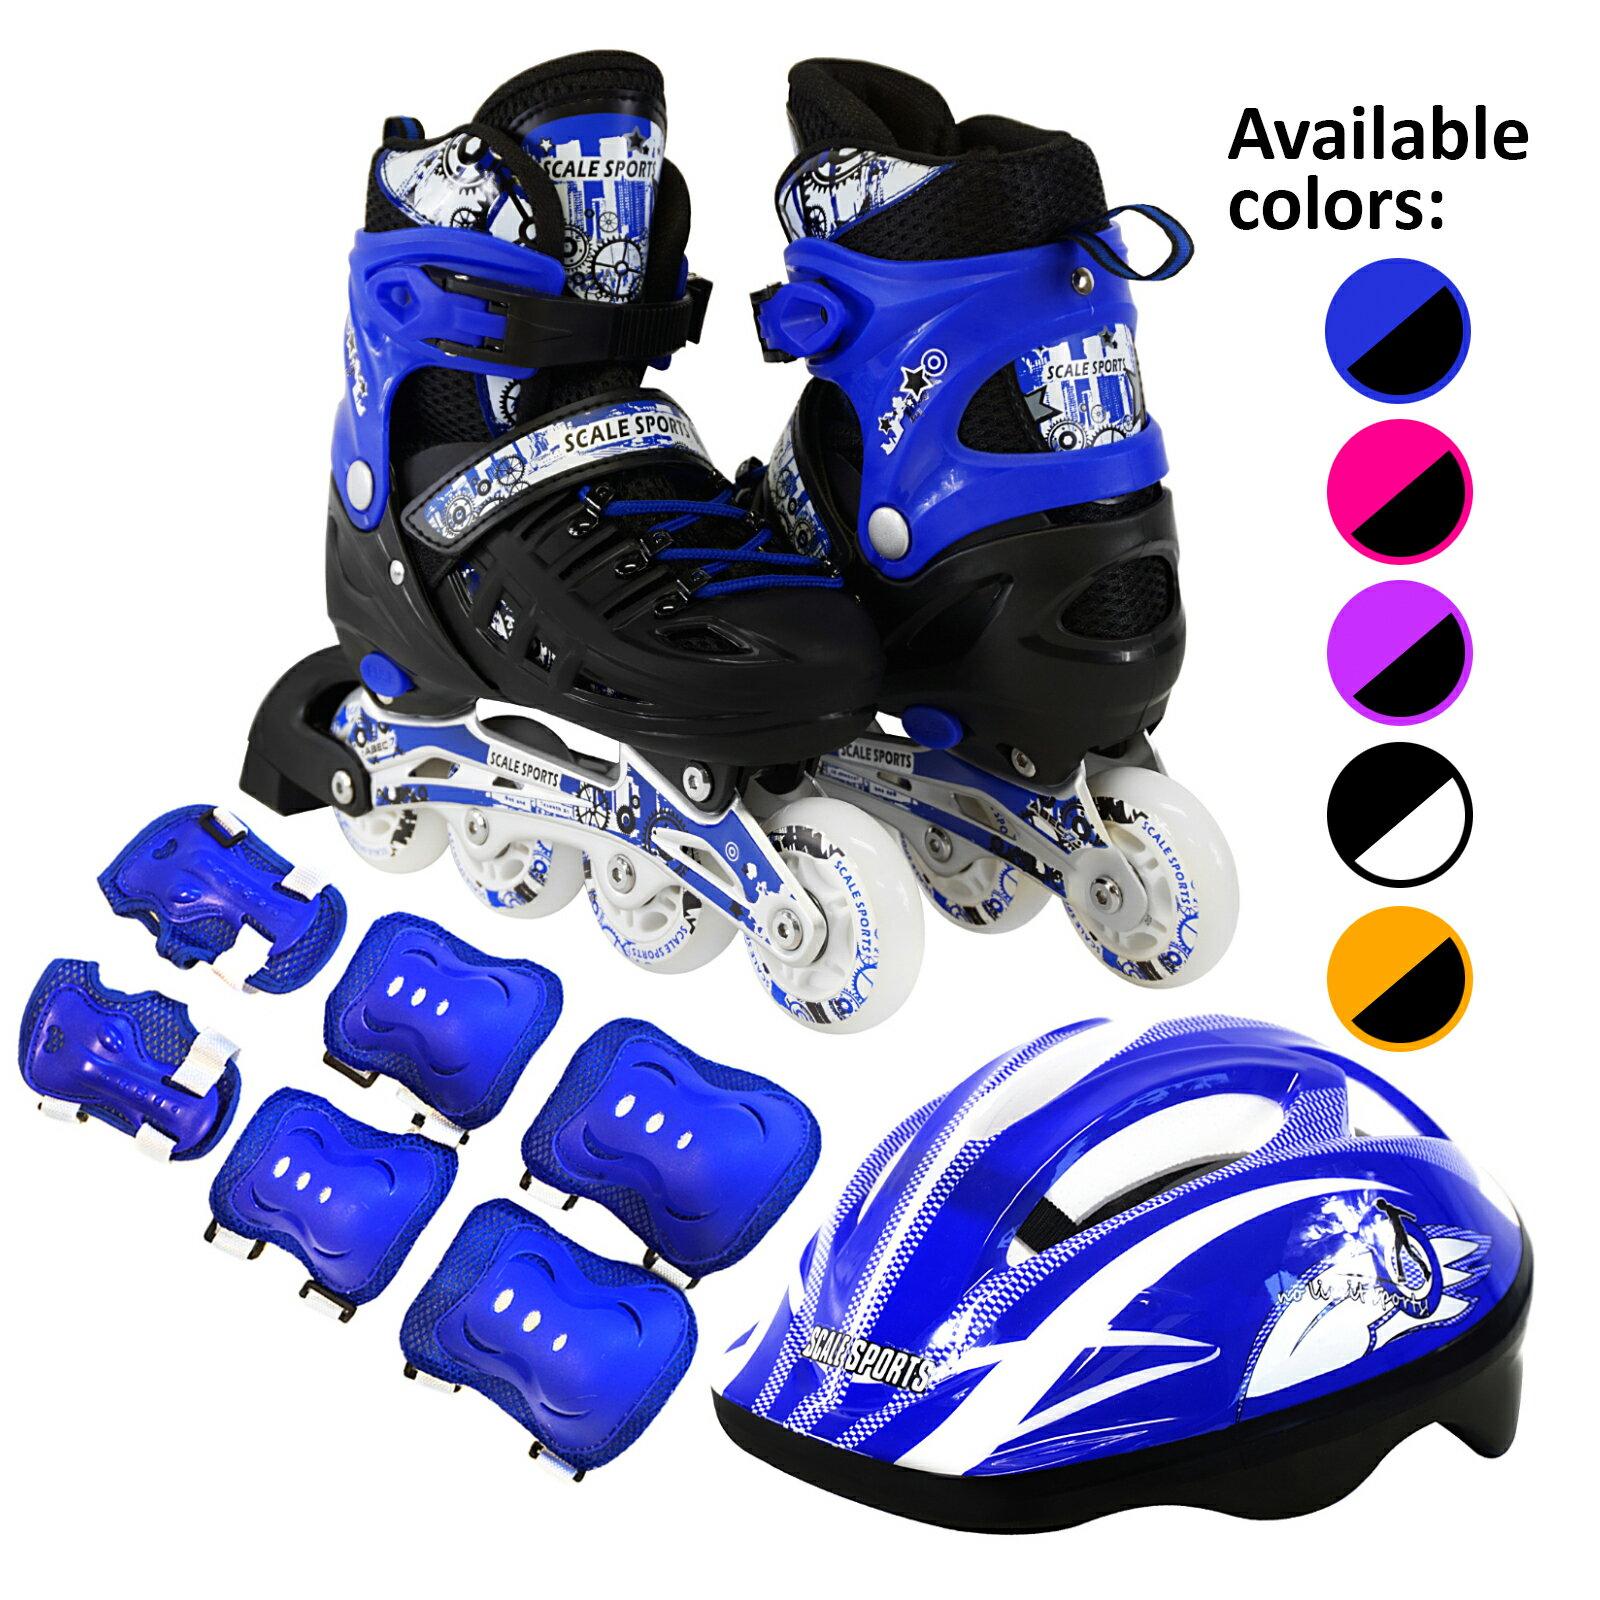 ac2c1e167d3 Scale Sports Kids Inline Skates Combo Set 6 PCS Protective Gear Helmet  Durable Safe Outdoor Roller